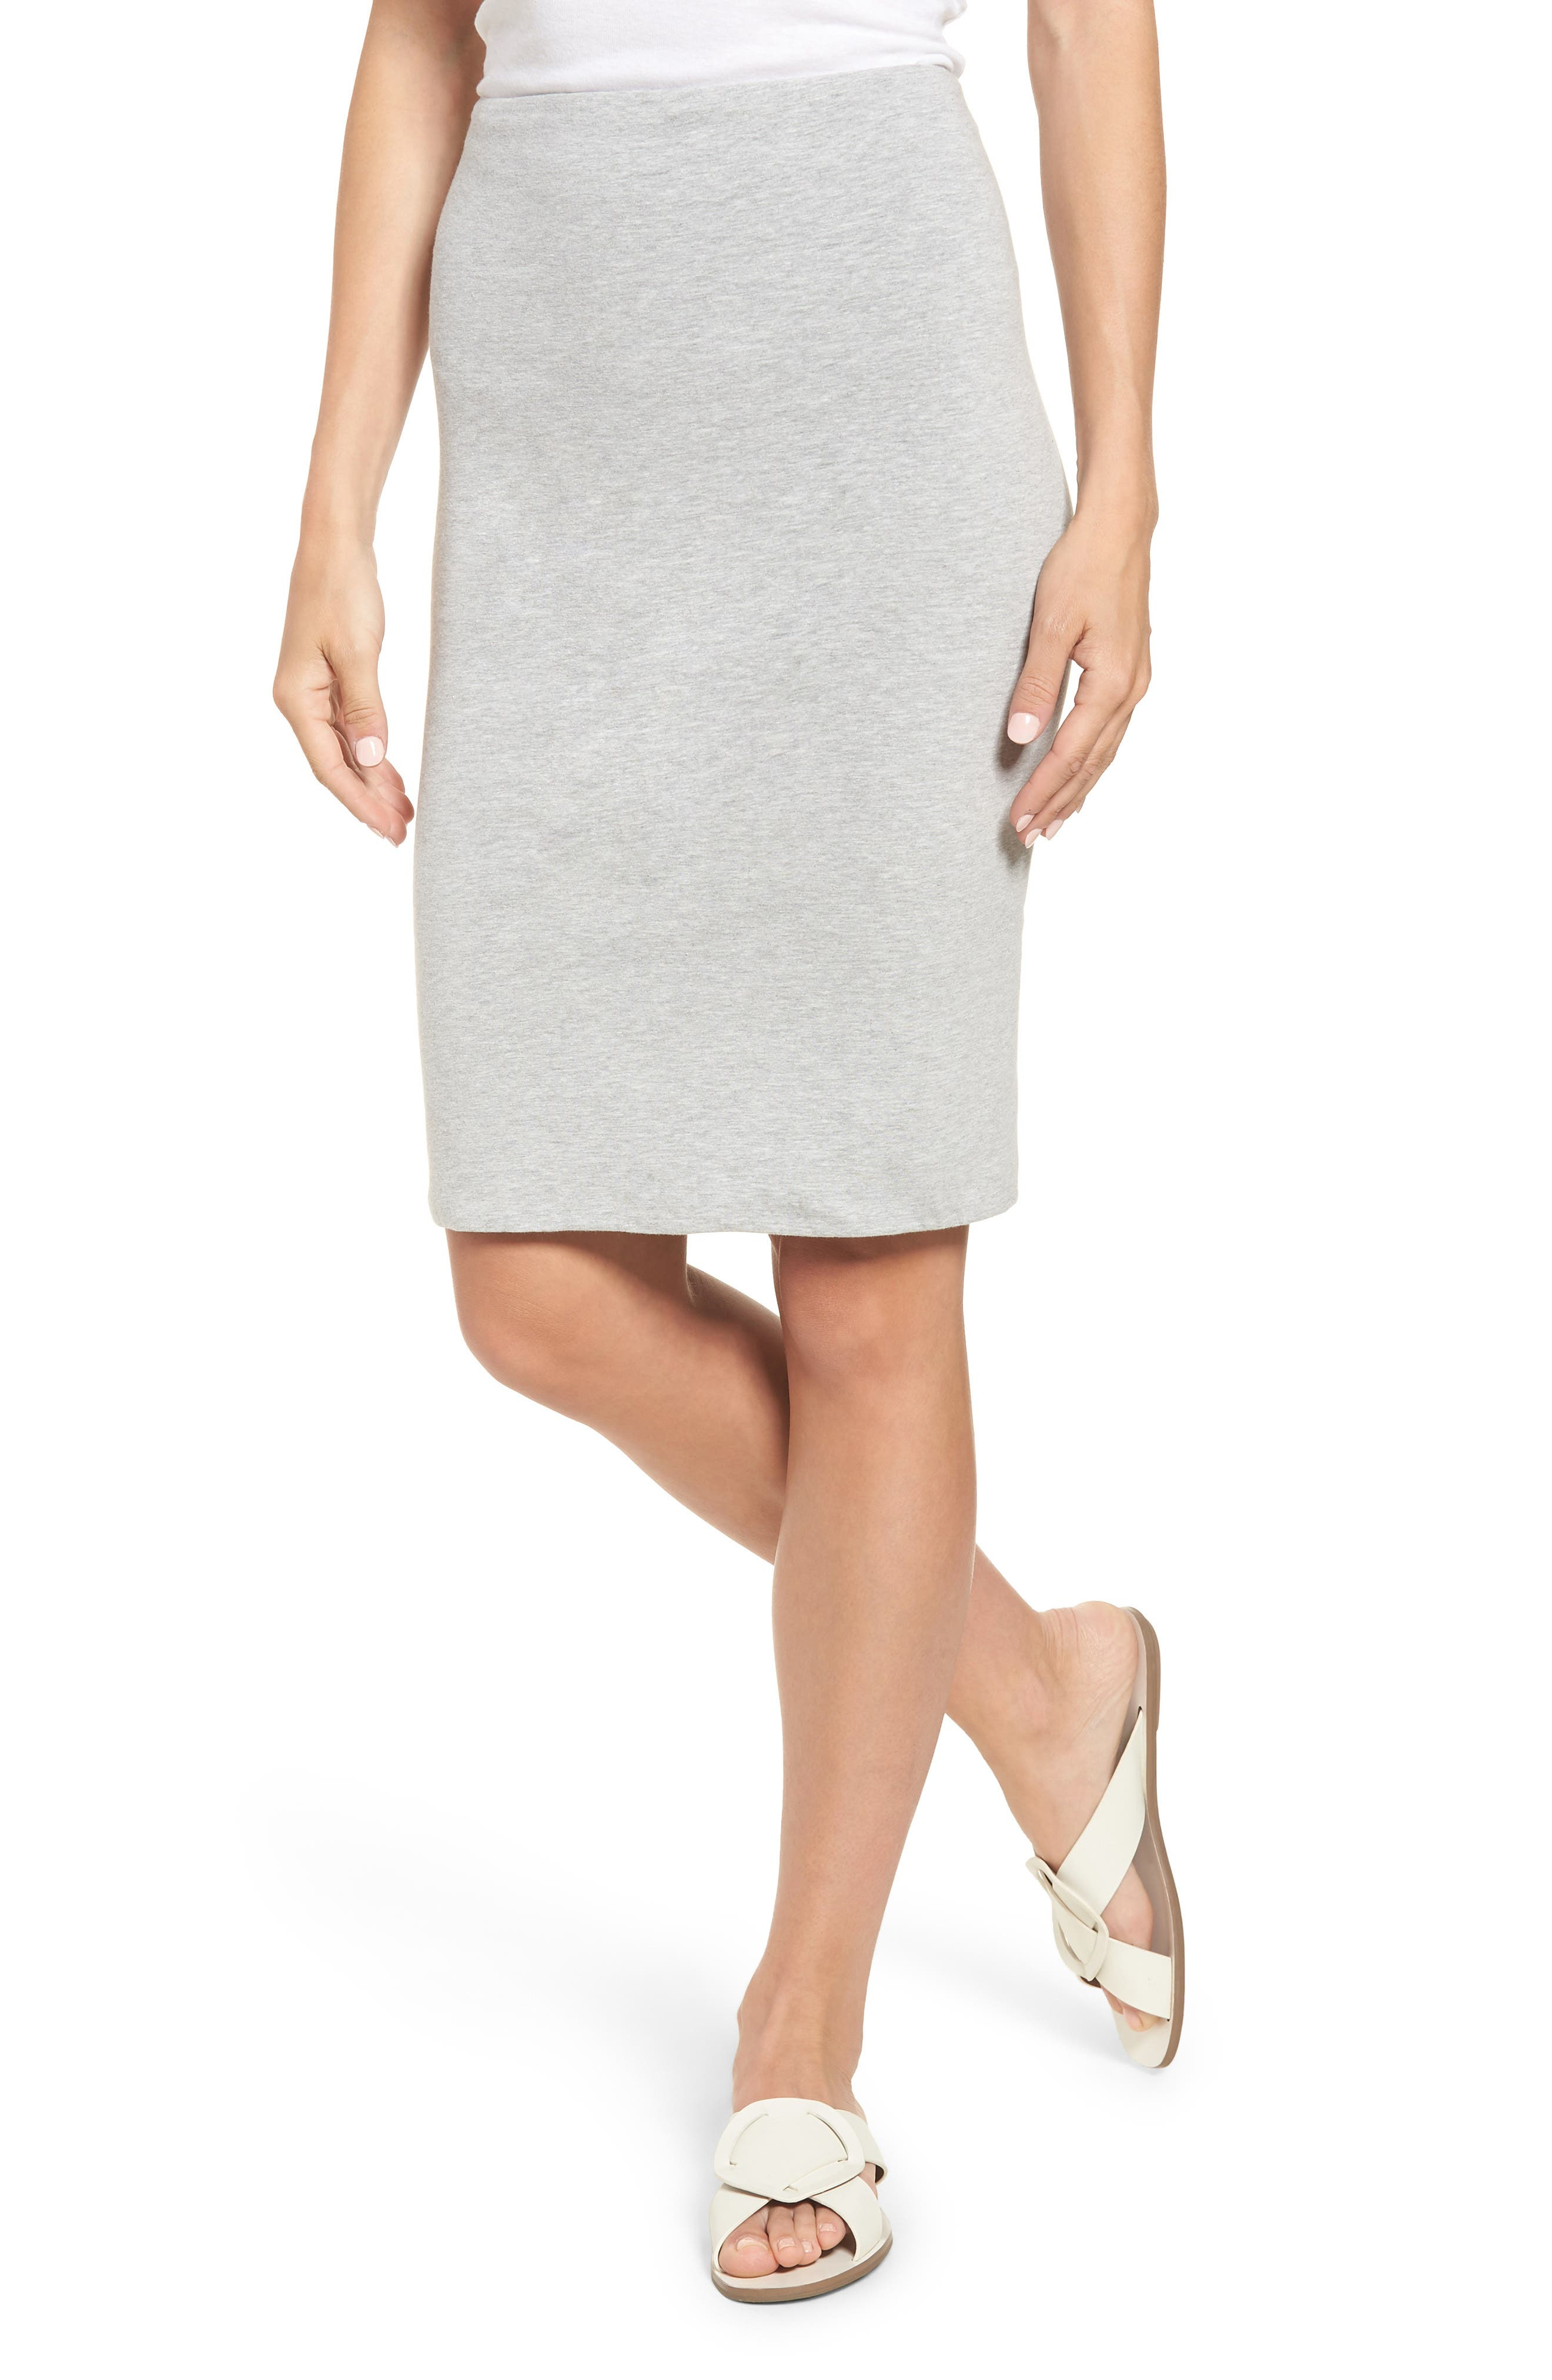 x Hi Sugarplum! Fornillo Pencil Skirt,                         Main,                         color, 055